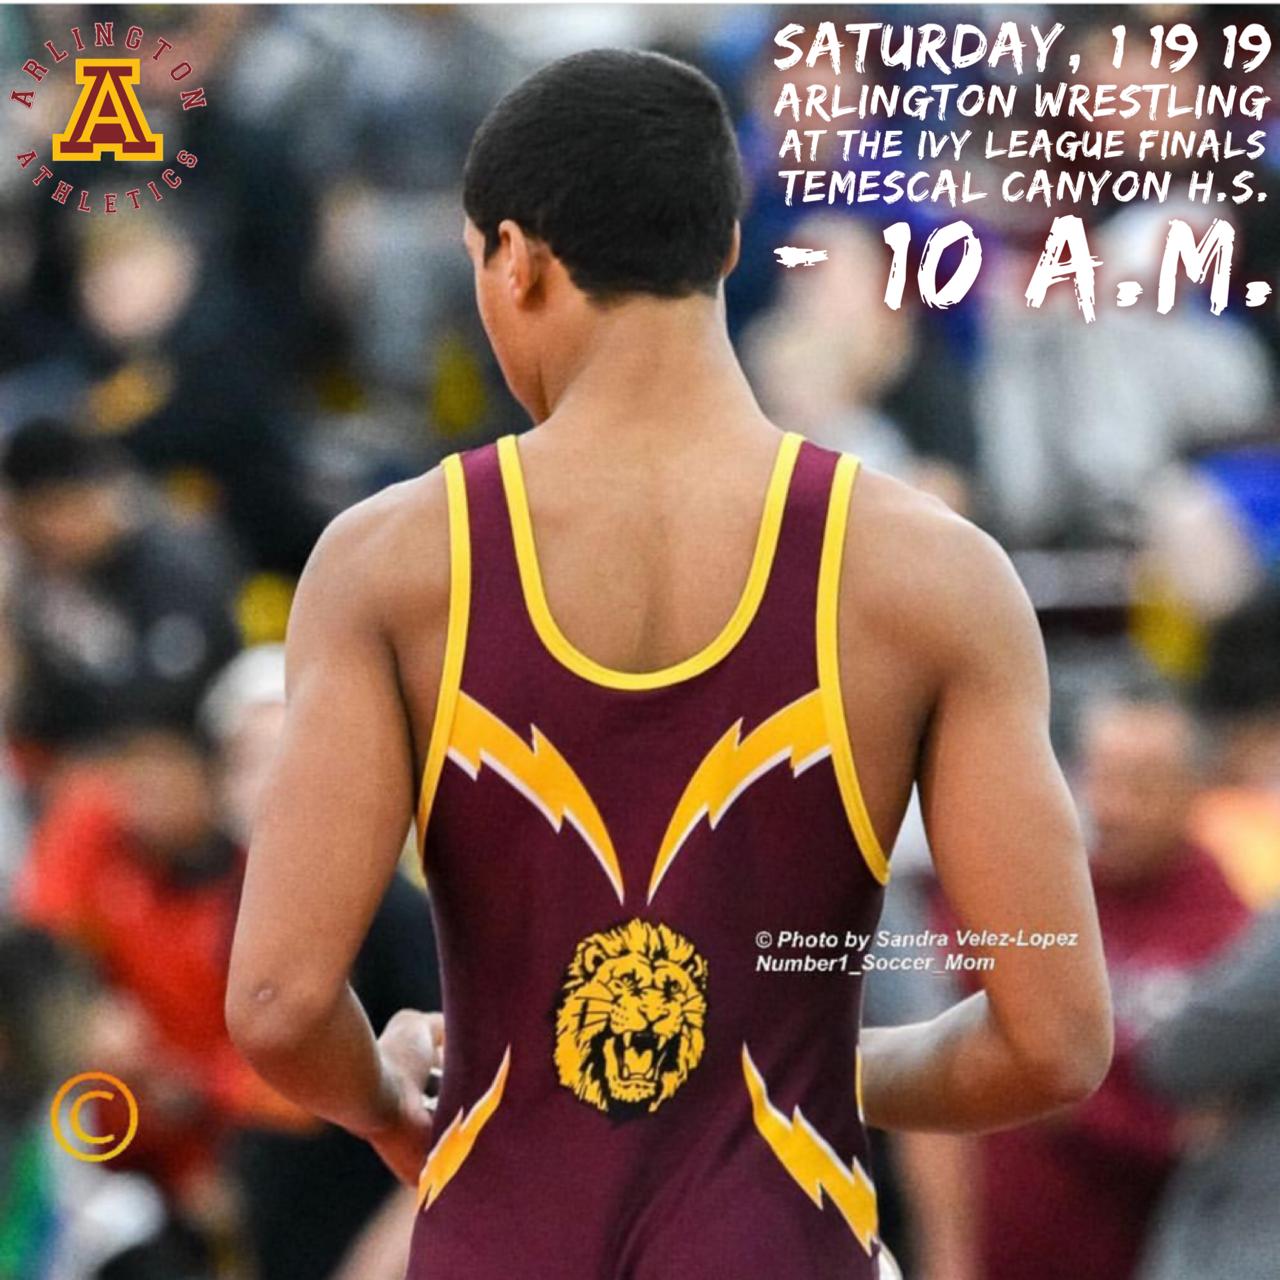 Saturday, 1/19/2019: Arlington Wrestling at the Ivy League Wrestling Championships at Temescal Canyon – 10 a.m.